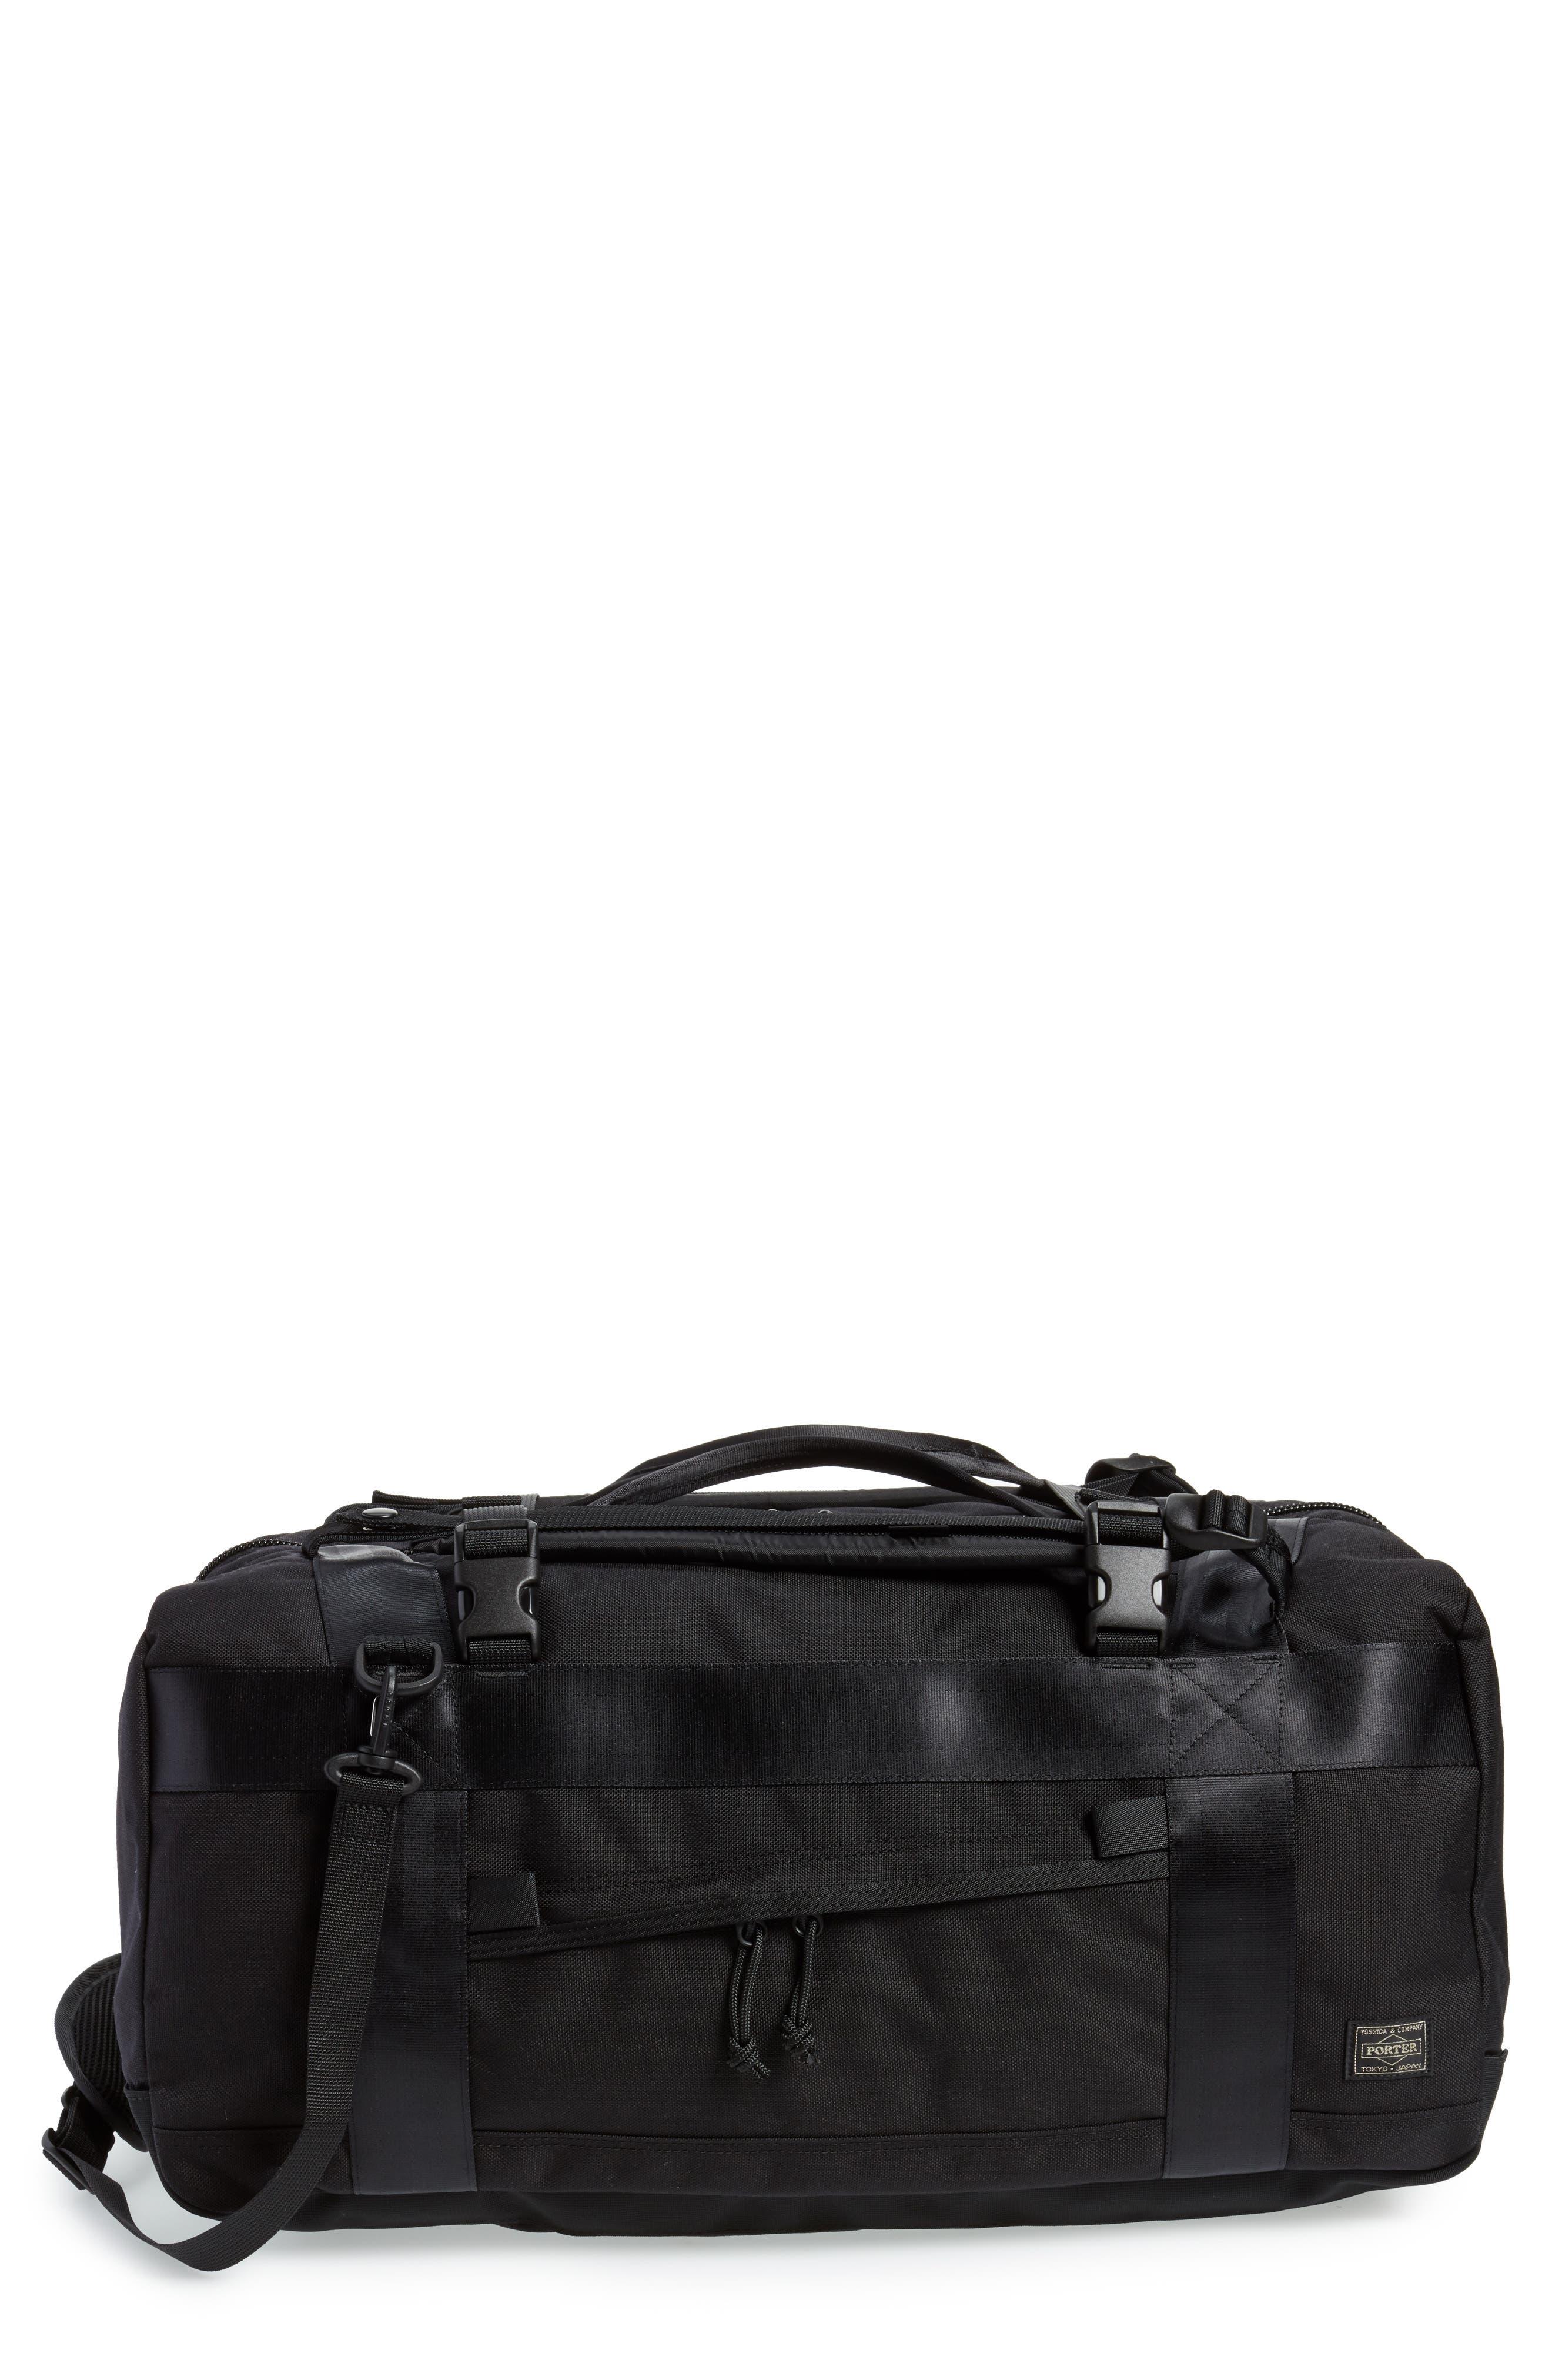 Porter-Yoshida & Co. Boothpack Convertible Duffel Bag,                         Main,                         color, BLACK